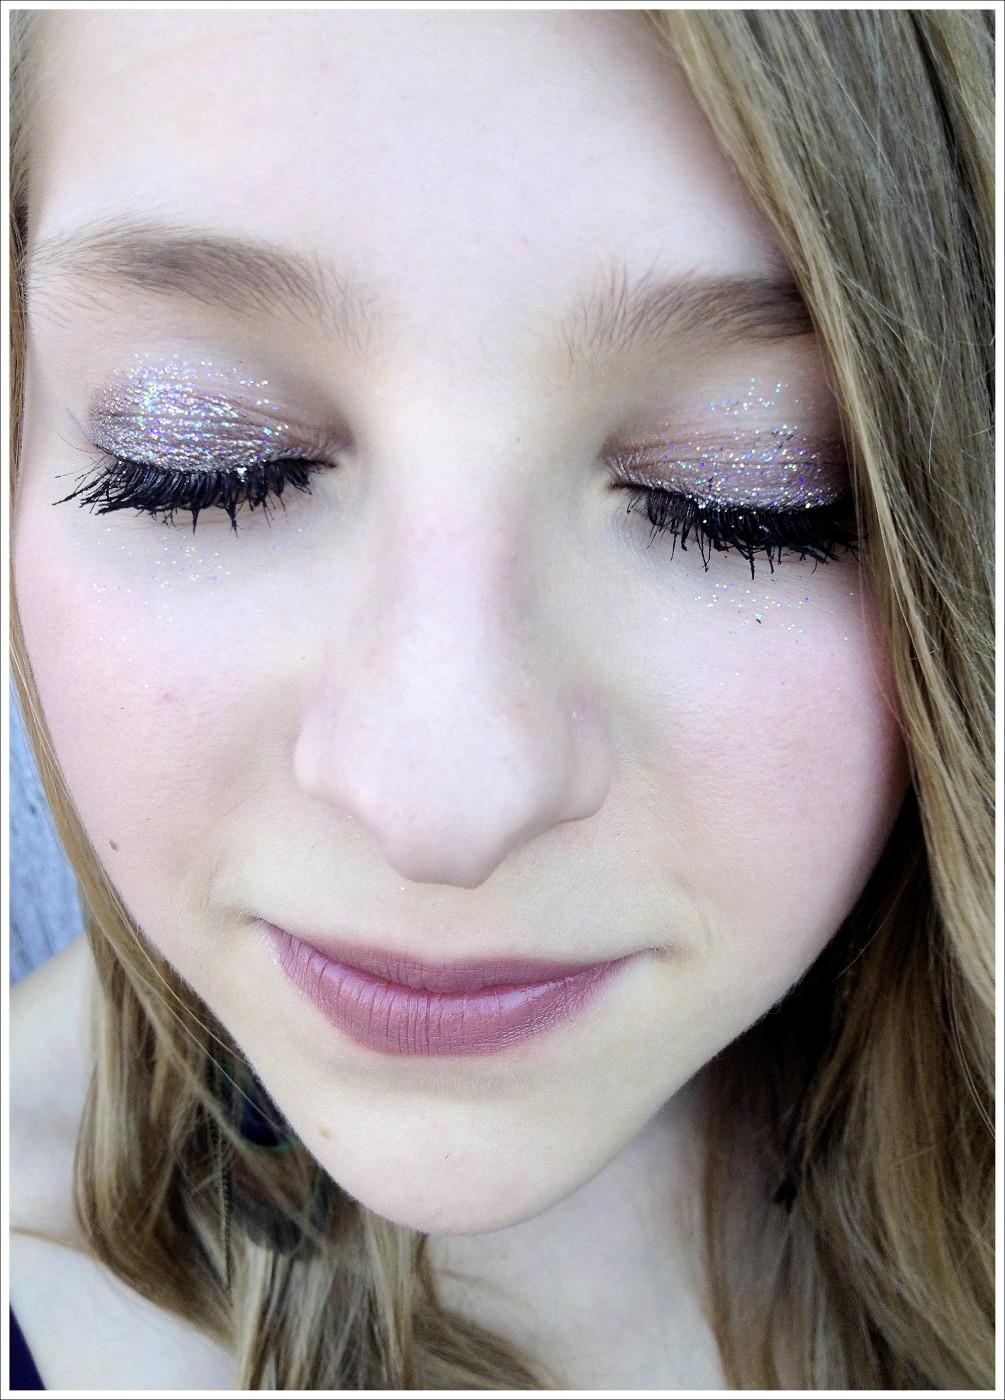 Leala the Great, </span><span><em>Sparkly eyes girl with eyes shut</em>, </span><span>2012